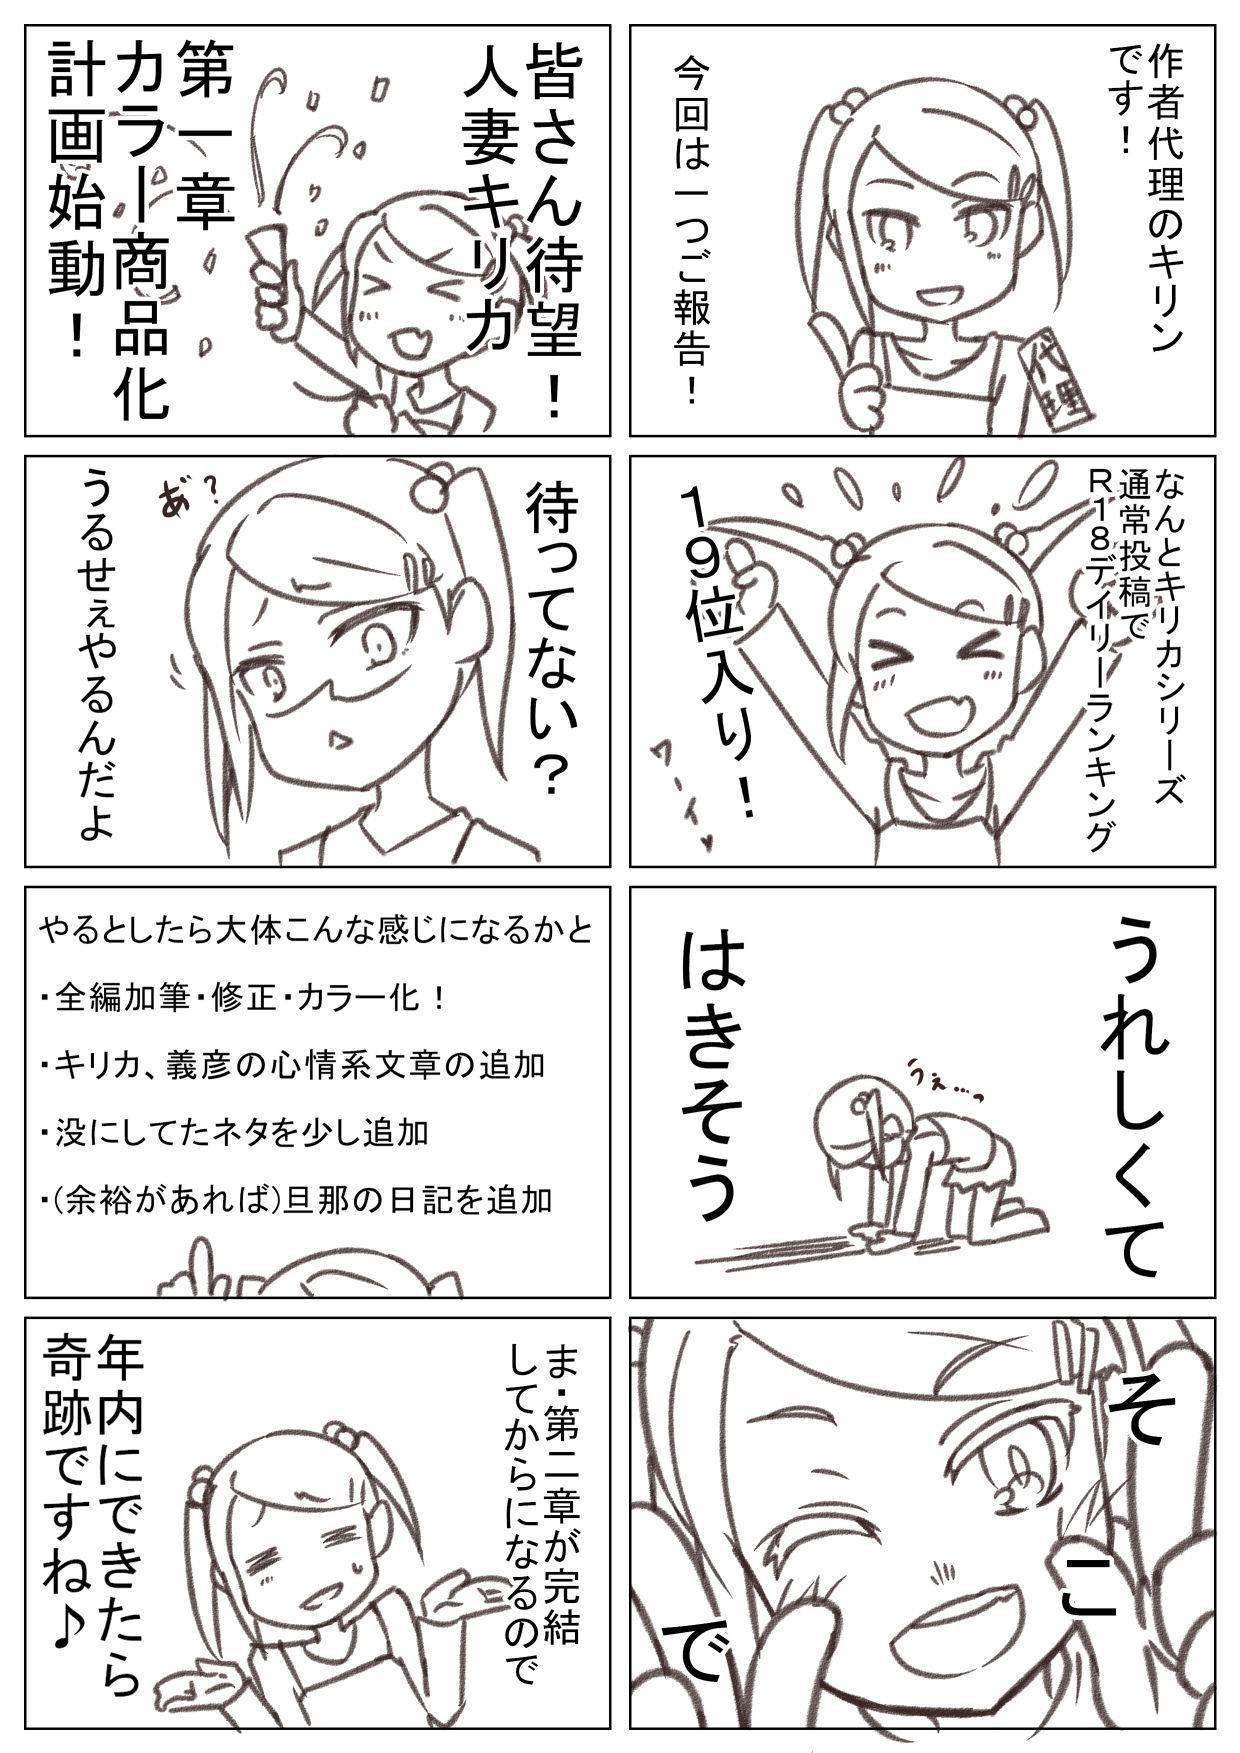 Hitozuma Kirika 191